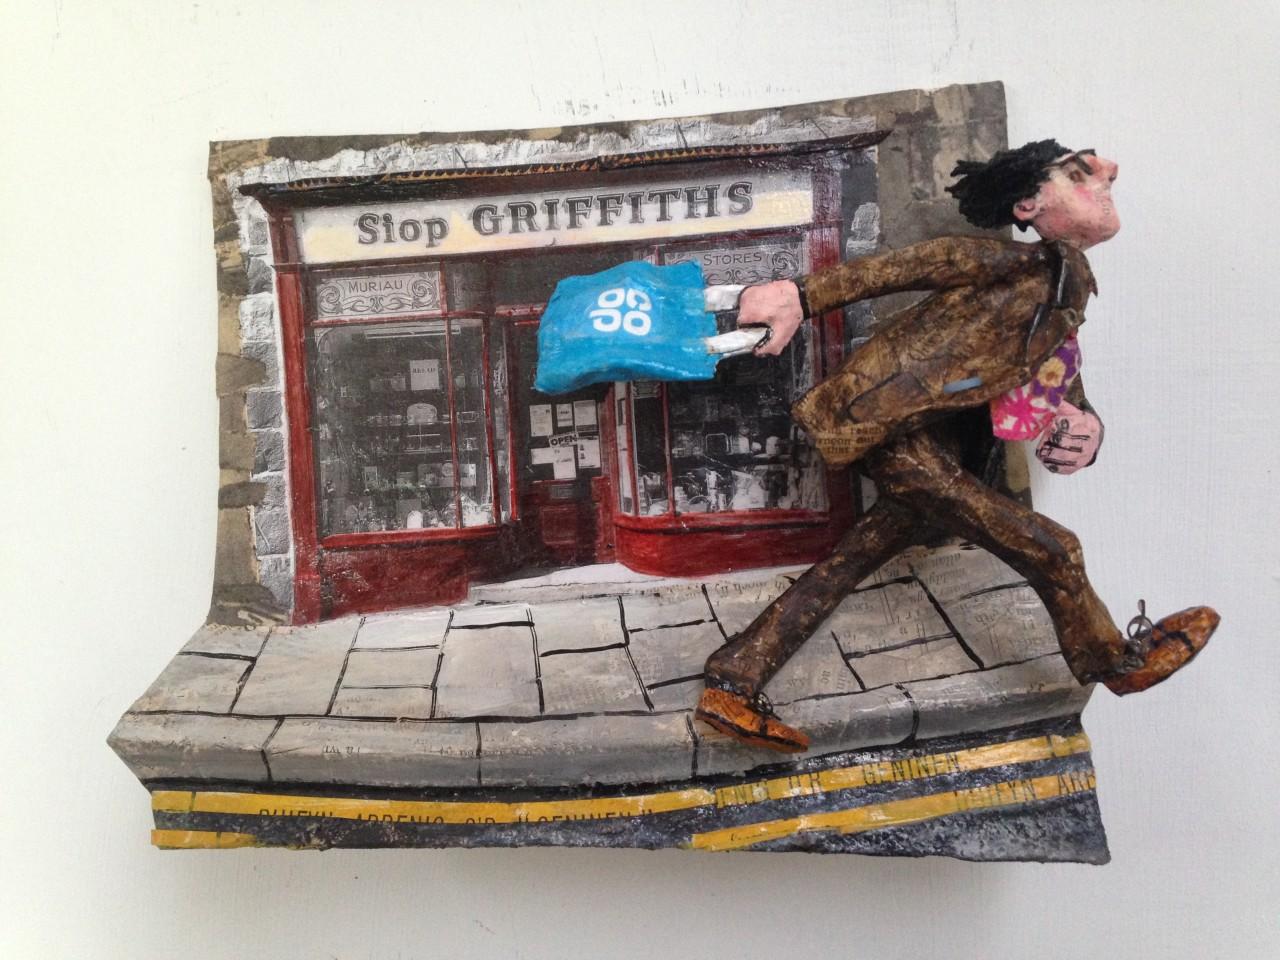 Luned Rhys Parri, Rhuthro Heibio Siop Griffiths / Rushing Past Siop Griffiths